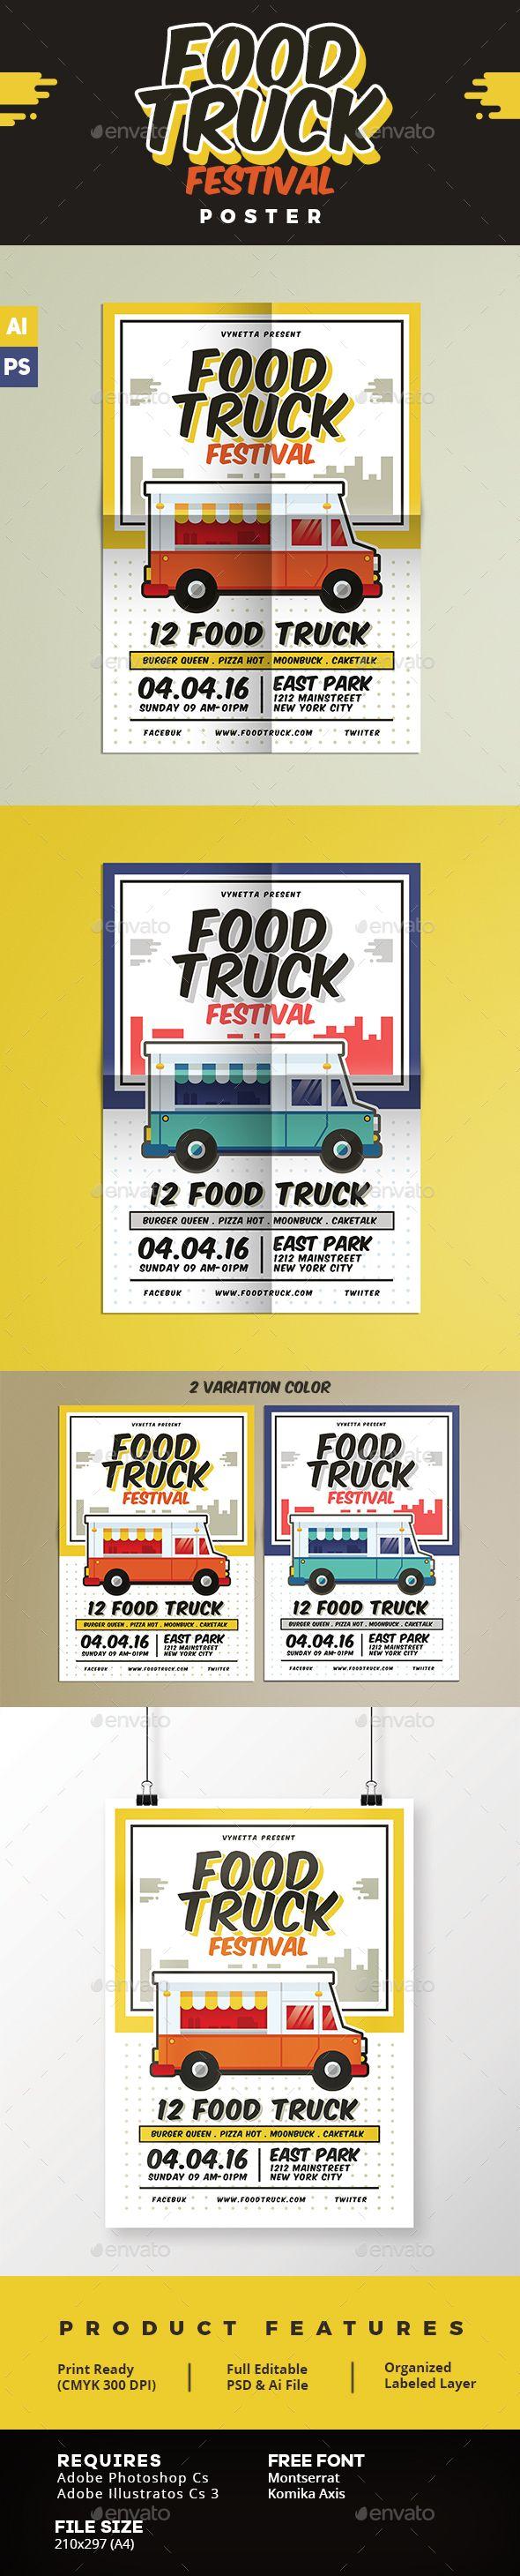 Food Truck Festival Poster Template PSD. Download here: http://graphicriver.net/item/food-truck-festival-poster/15778461?ref=ksioks